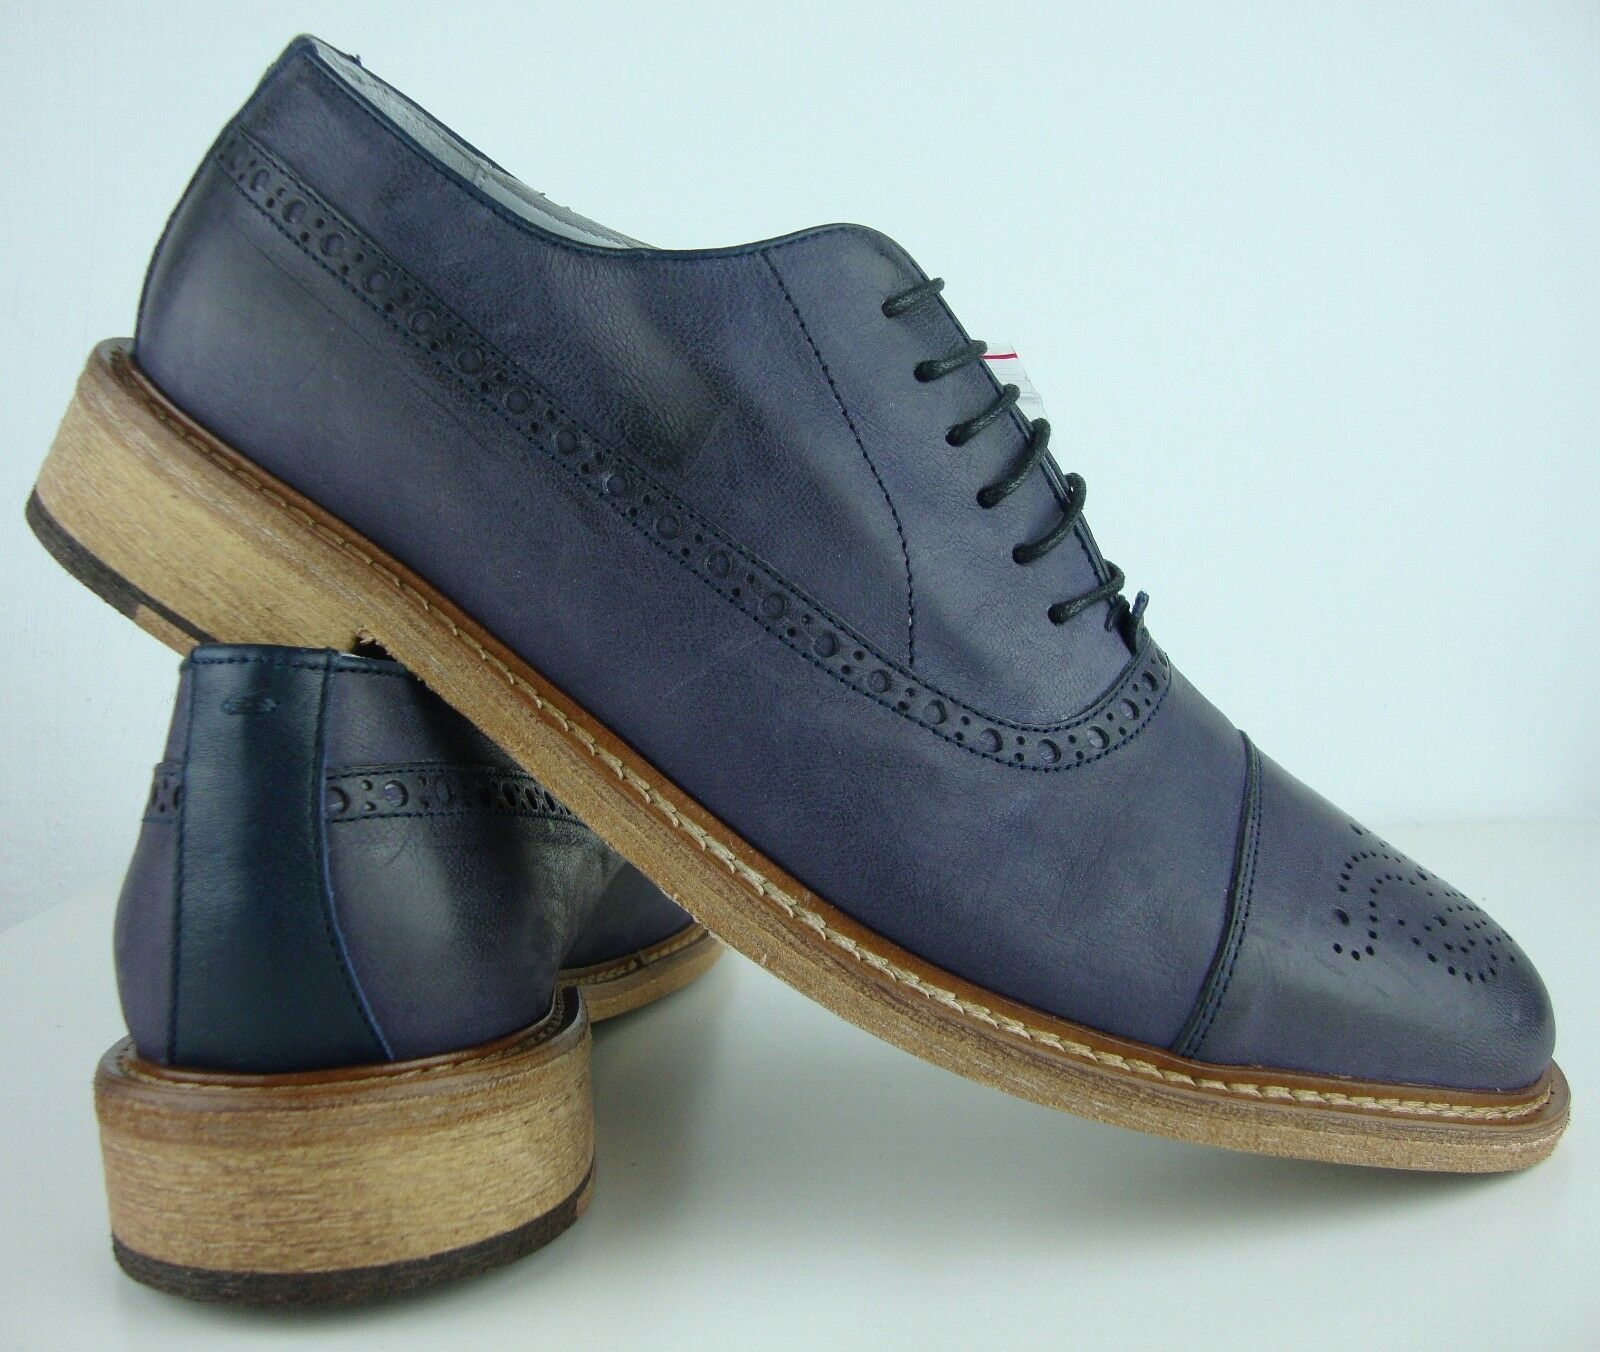 PATRIZIA PEPE  Halbschuhe Business Schuhe Schuhe Schuhe Classic Schnürschuhe Gr.45 NEU  8b09e1